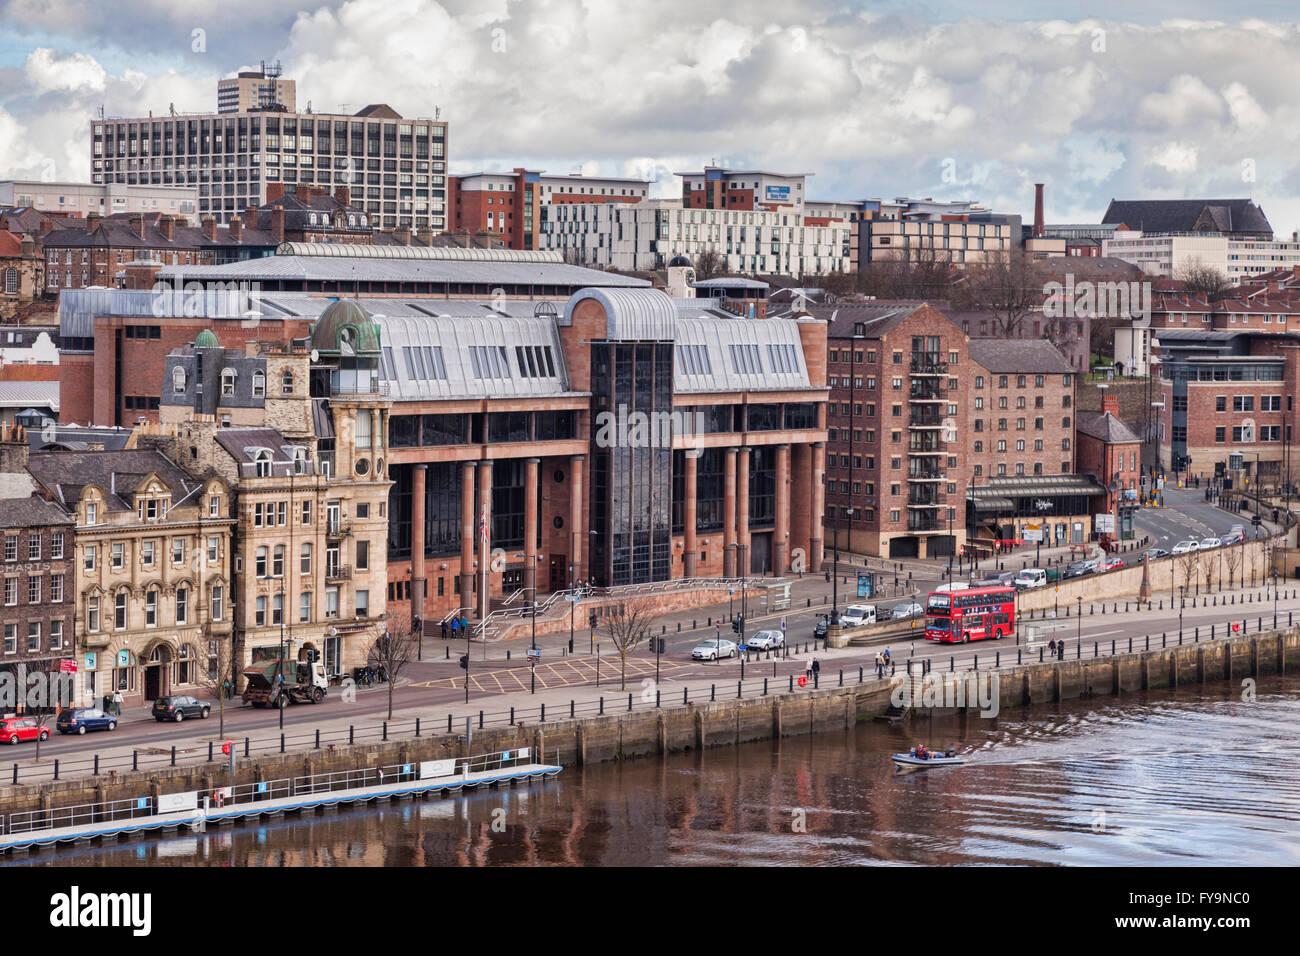 Newcastle-upon-Tyne Crown Court, Newcastle Quays, Tyne and Wear, England, UK Stock Photo